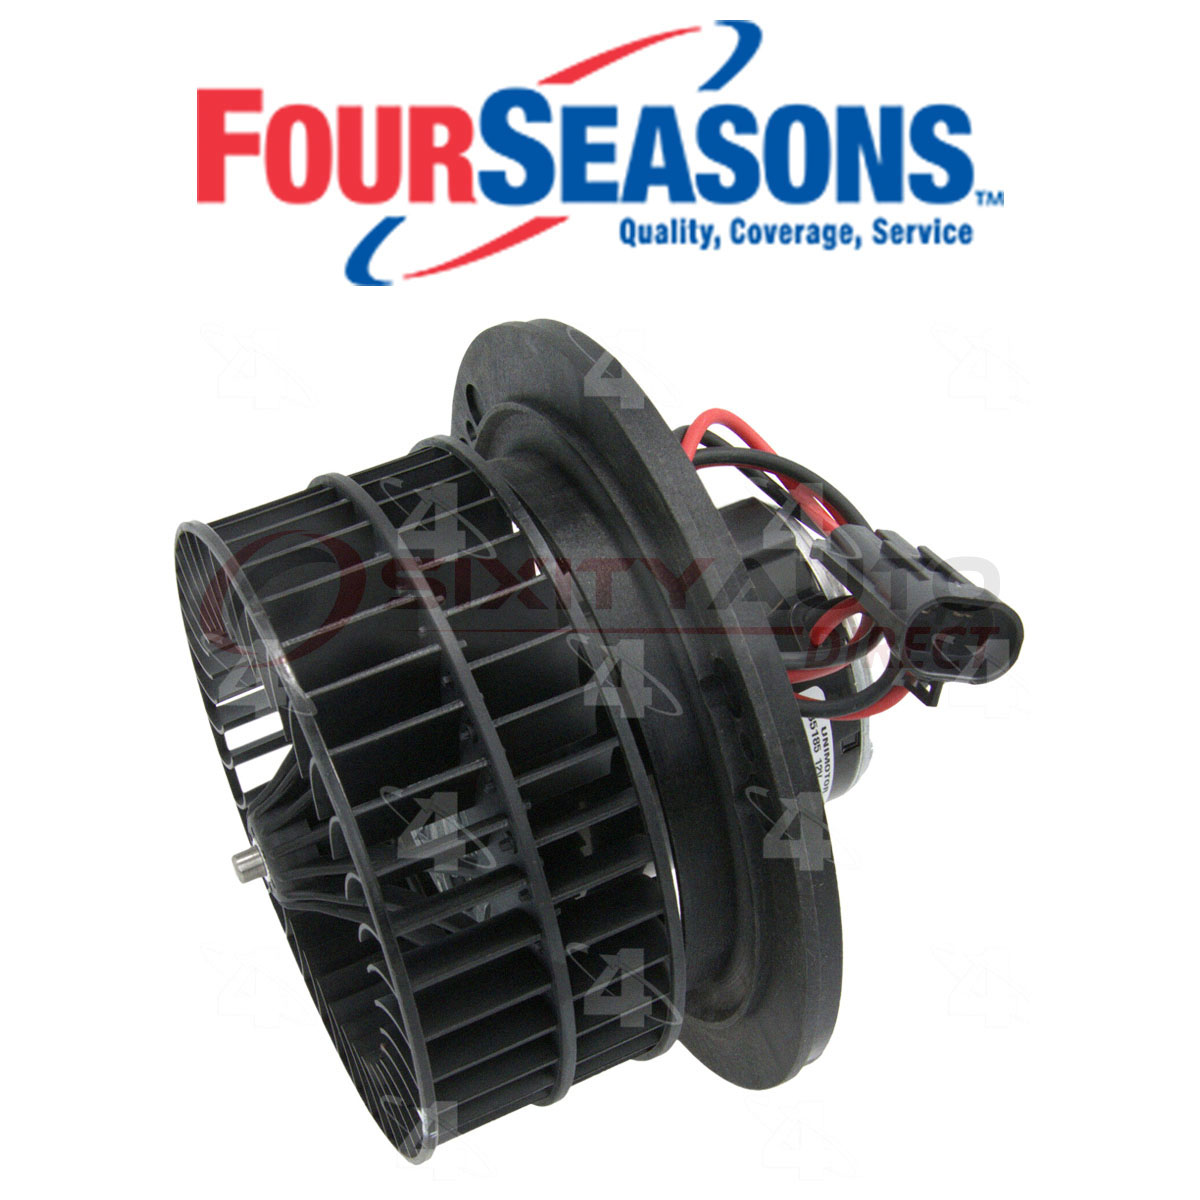 Four Seasons Hvac Blower Motor For 1979 Peugeot 504 2 0l L4 Heating Air Co Ebay